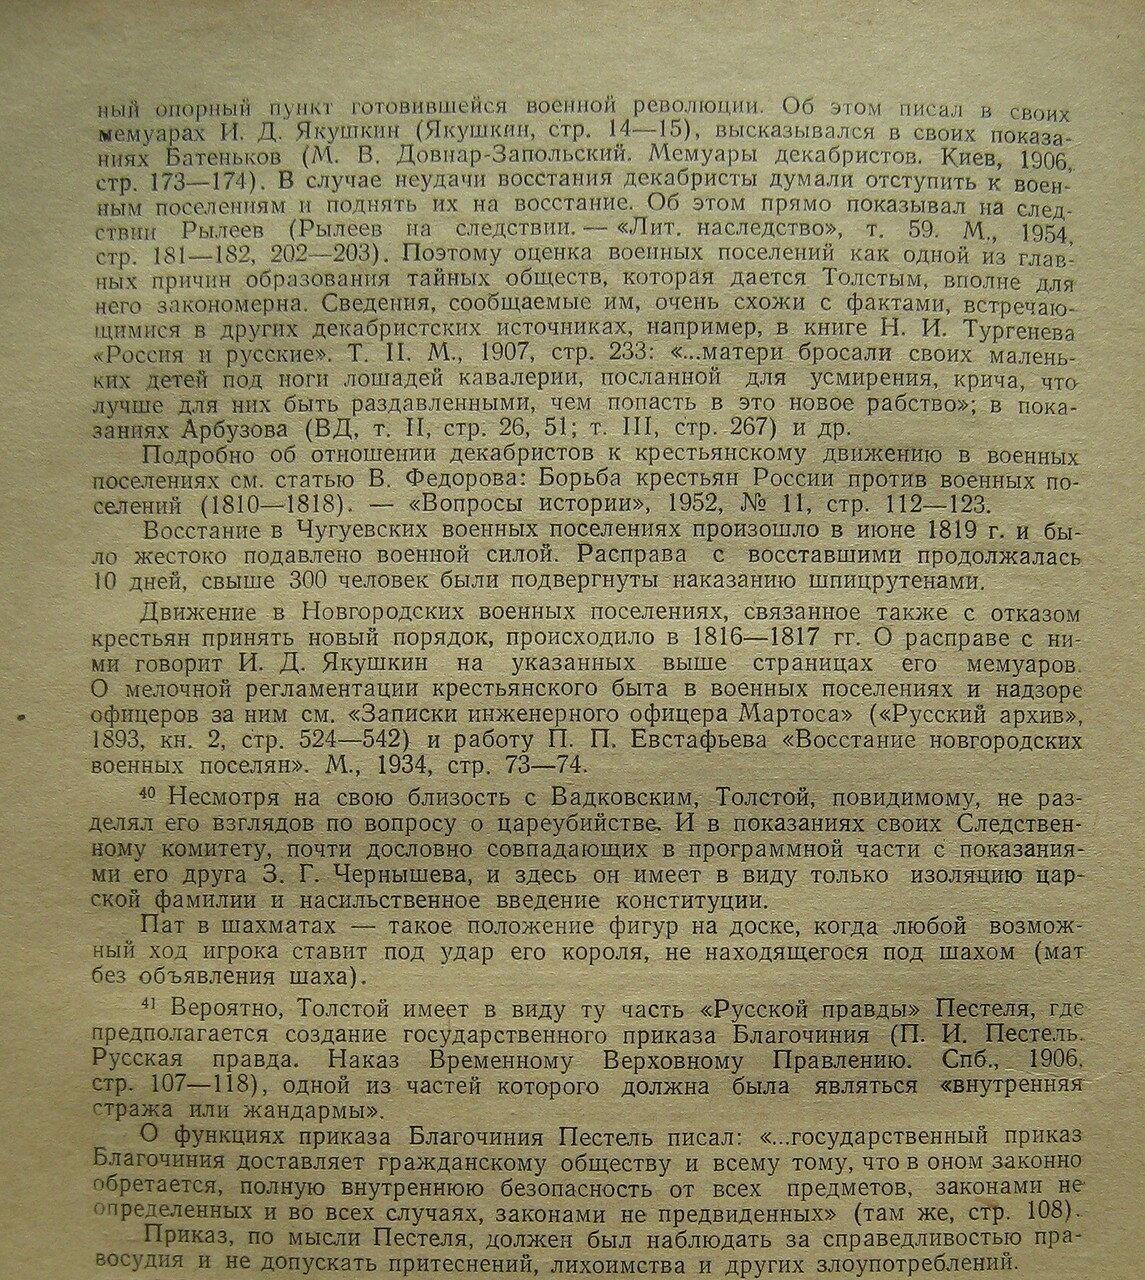 https://img-fotki.yandex.ru/get/508985/199368979.df/0_21f753_853b771e_XXXL.jpg